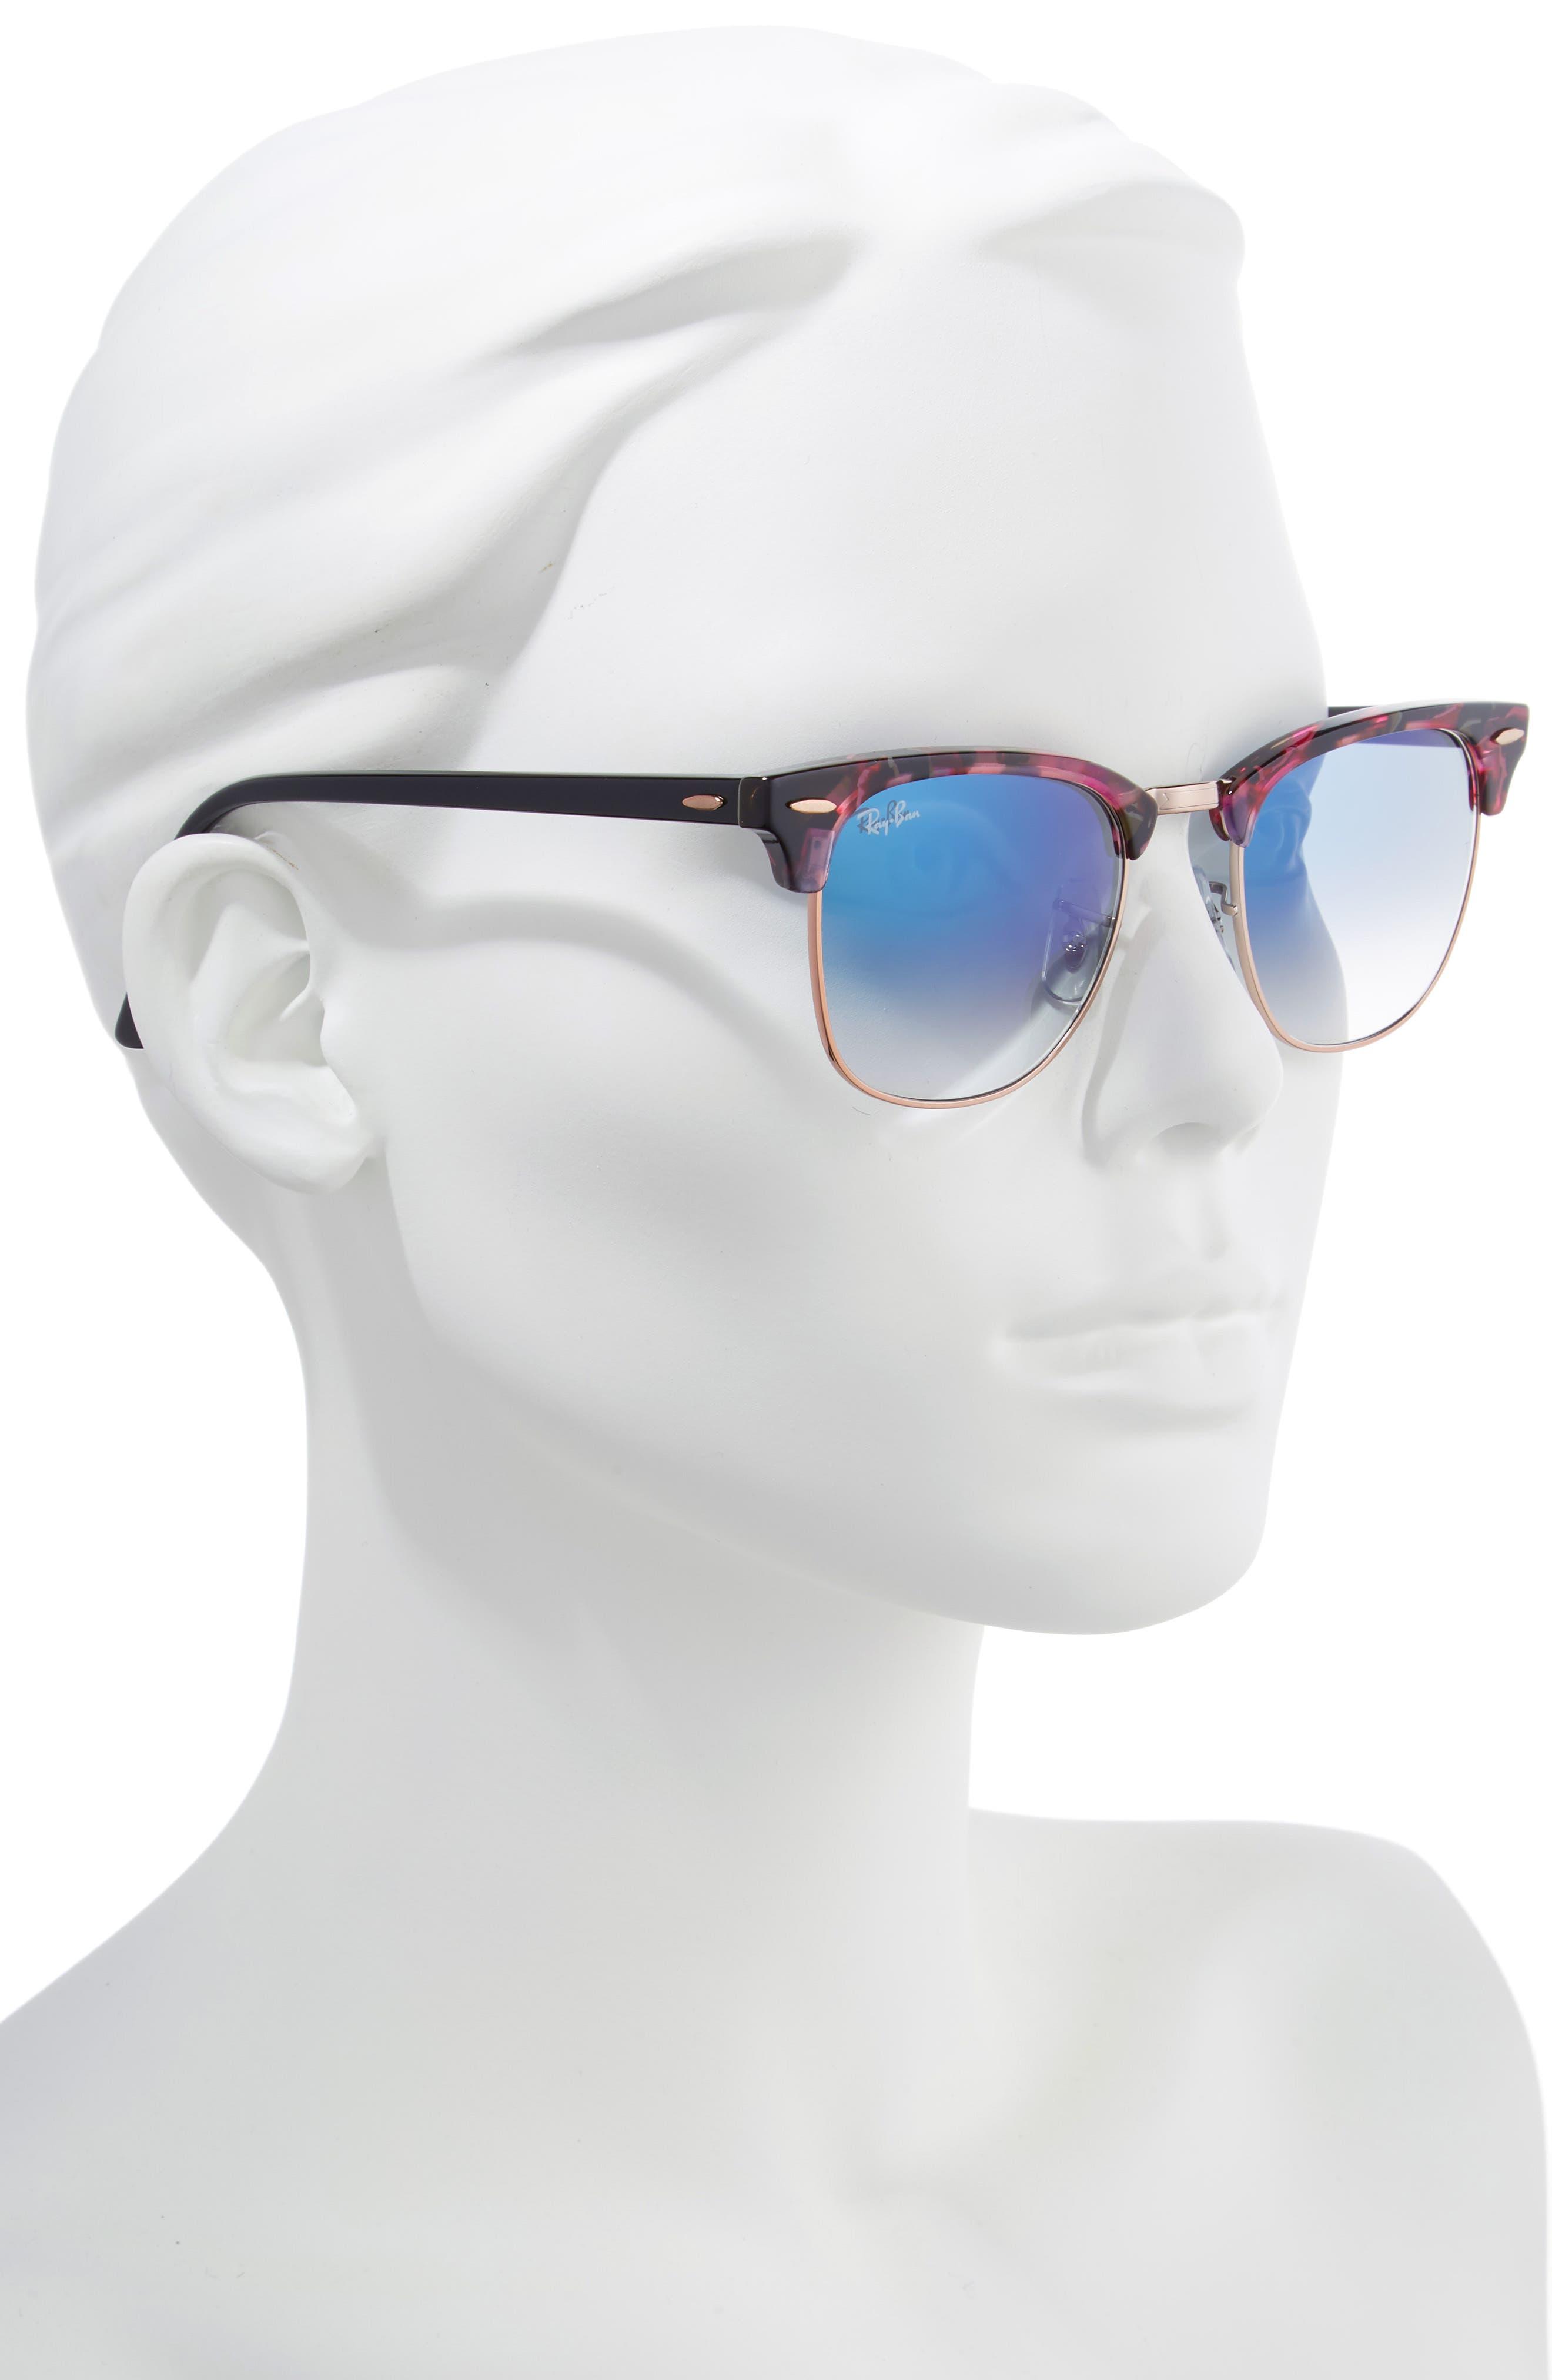 Clubmaster 51mm Gradient Sunglasses,                             Alternate thumbnail 2, color,                             GREY/ VIOLET GRADIENT